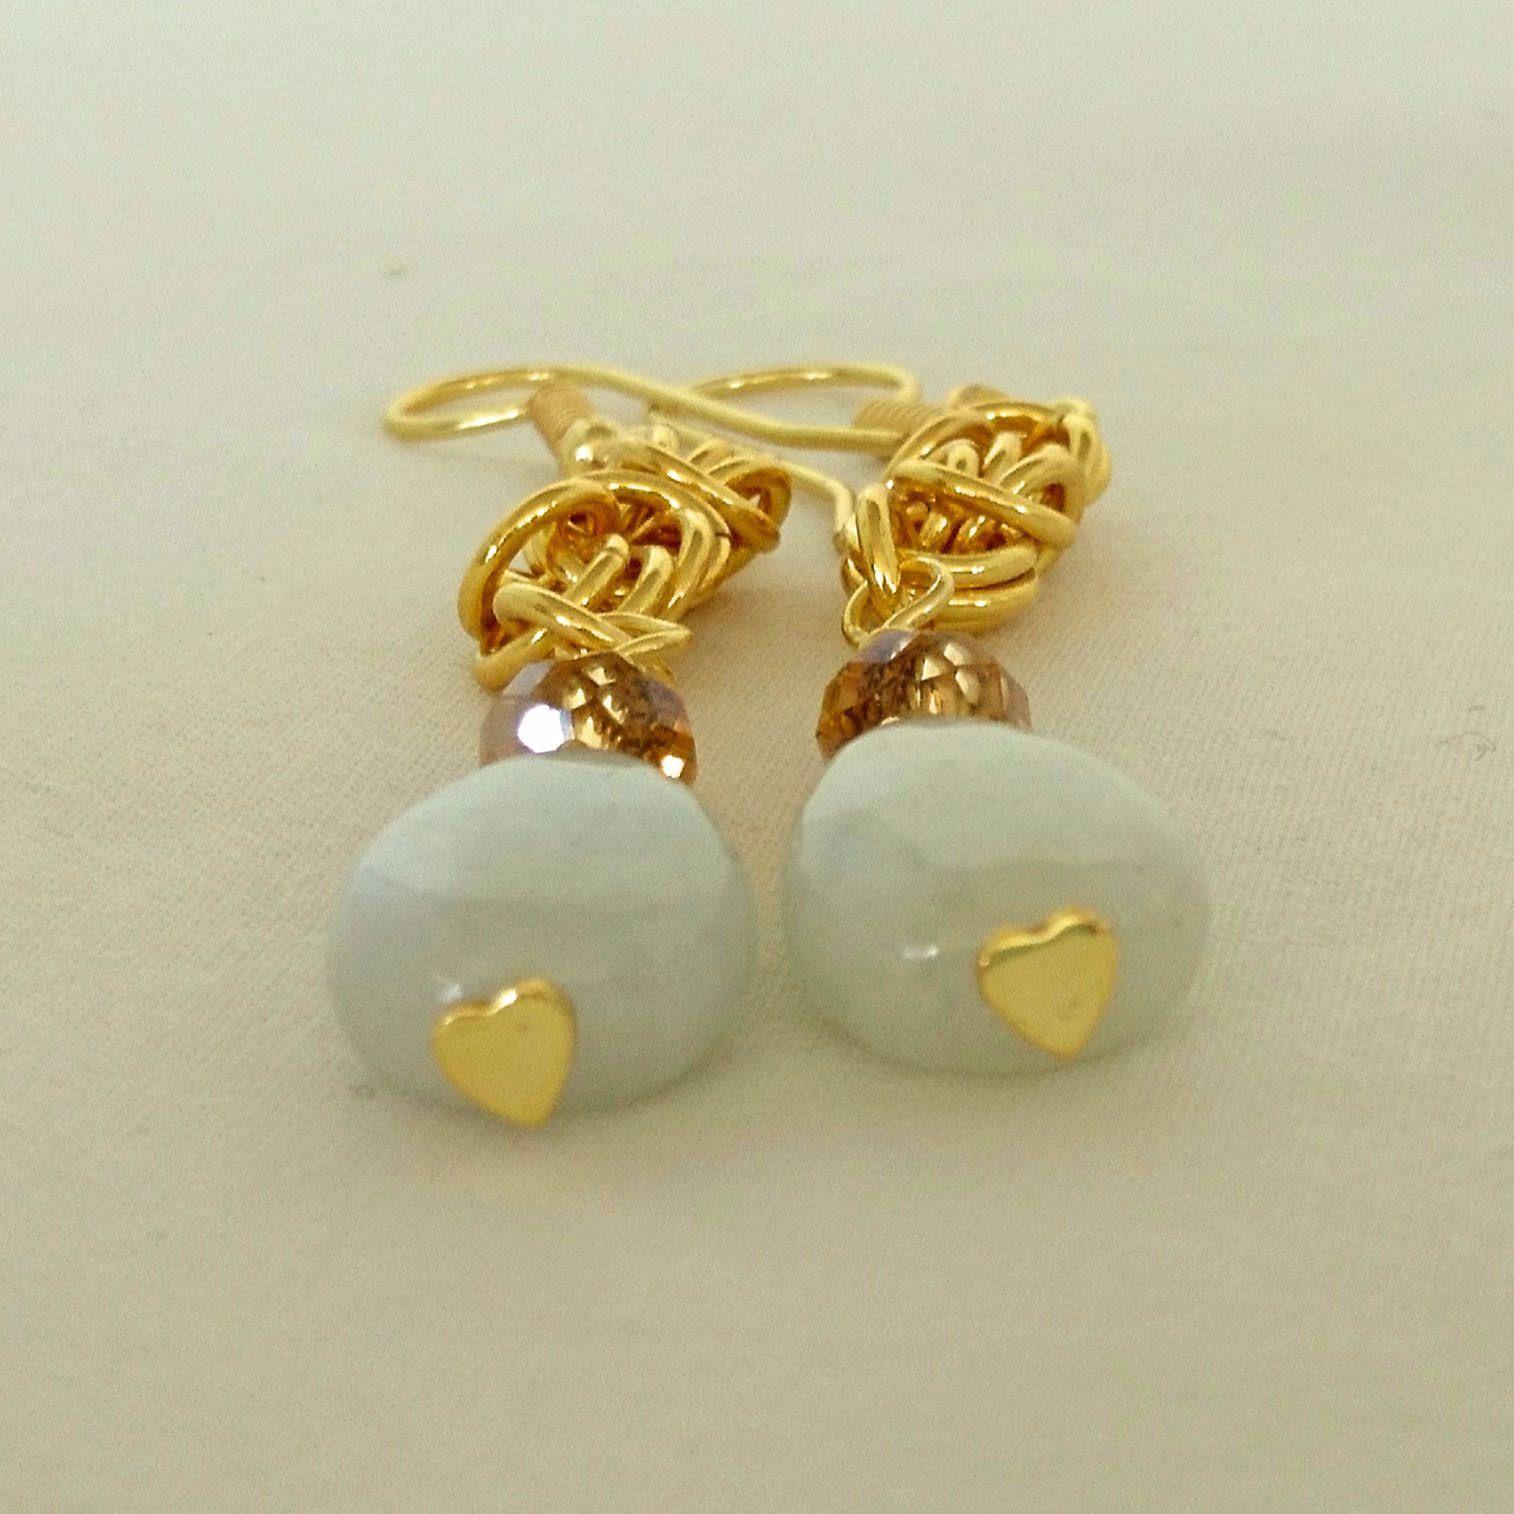 Semi Precious Jadeite Crystal Earrings Gemstone Handmade Chain Maille